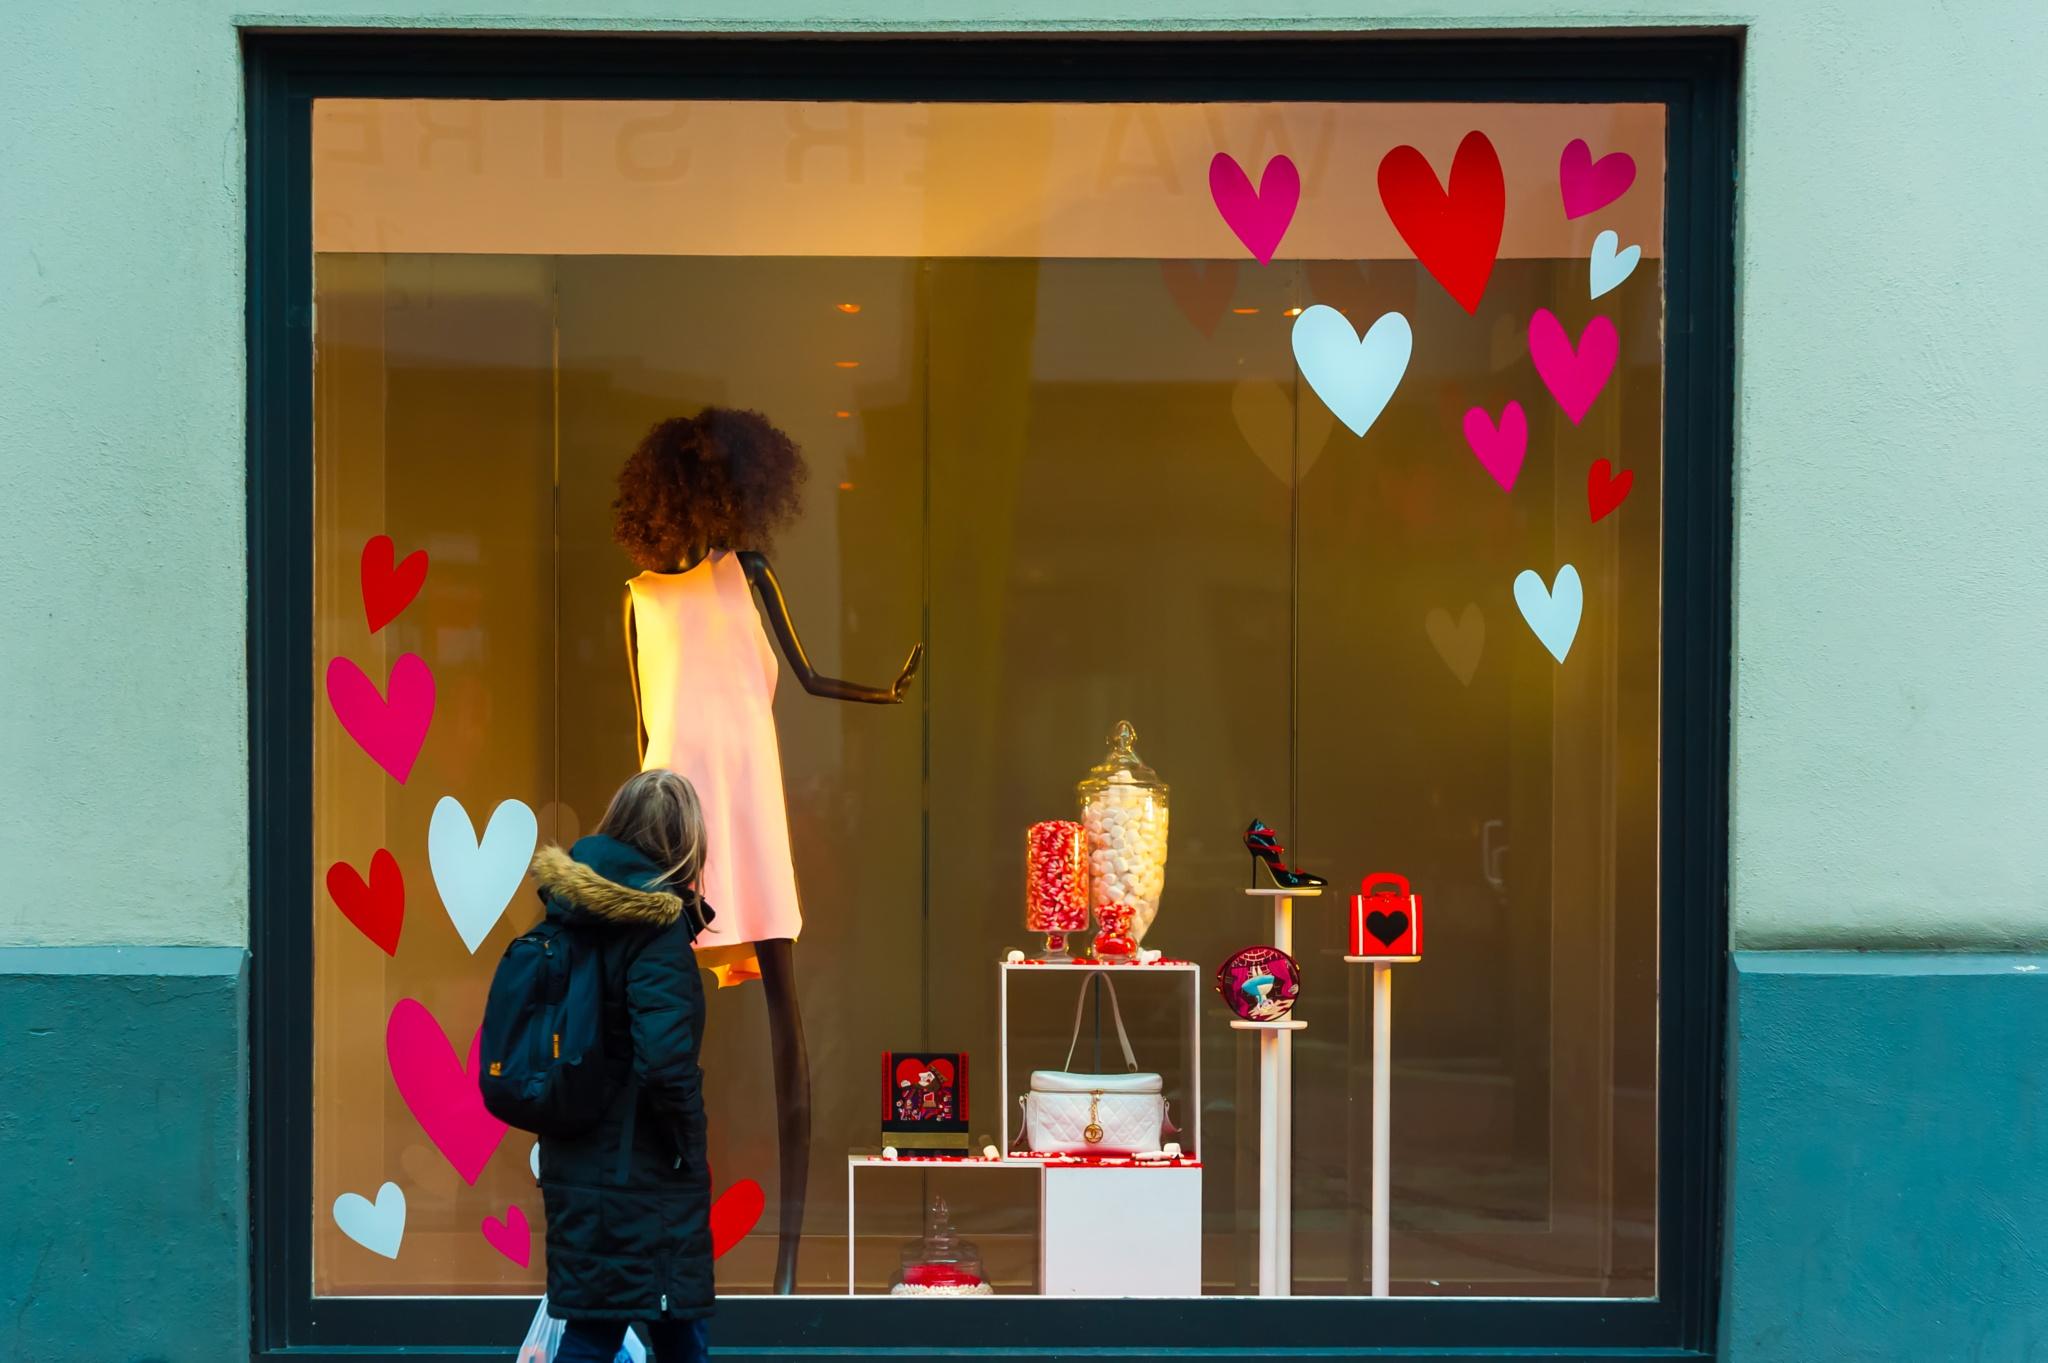 Window Shopping by gldosa